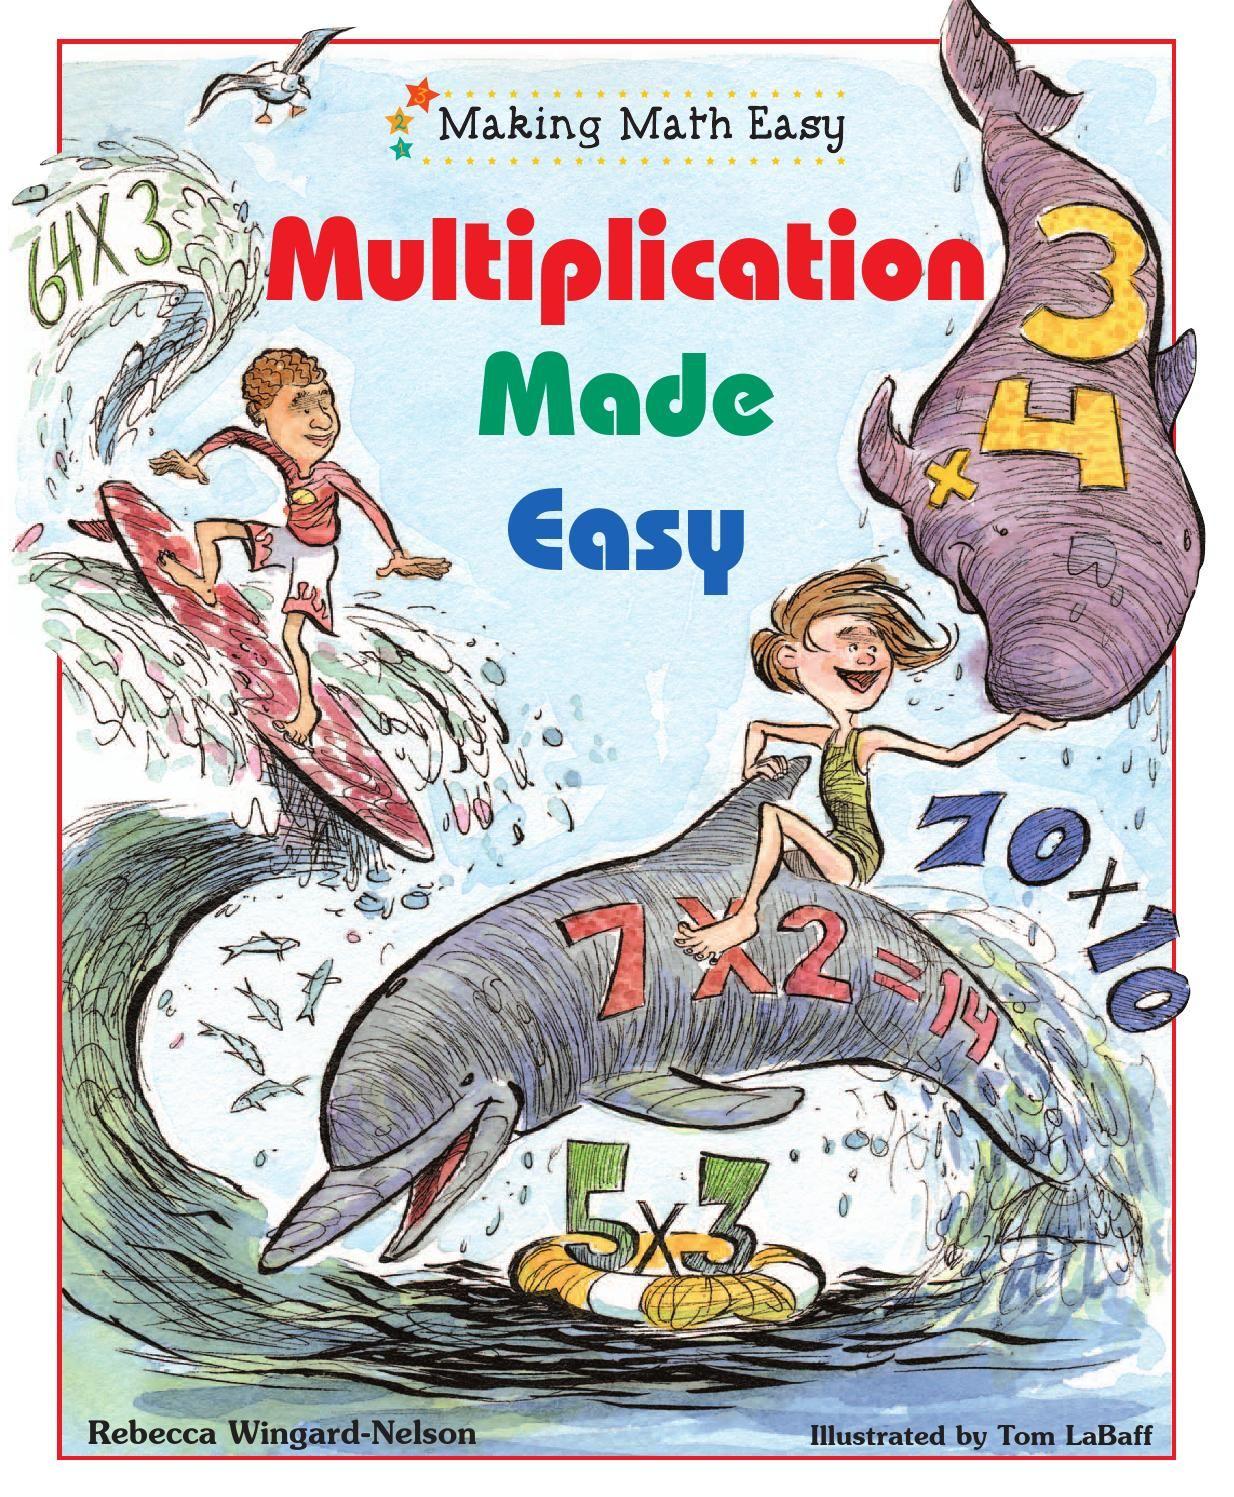 Making Math Easy Multiplication Made Easy